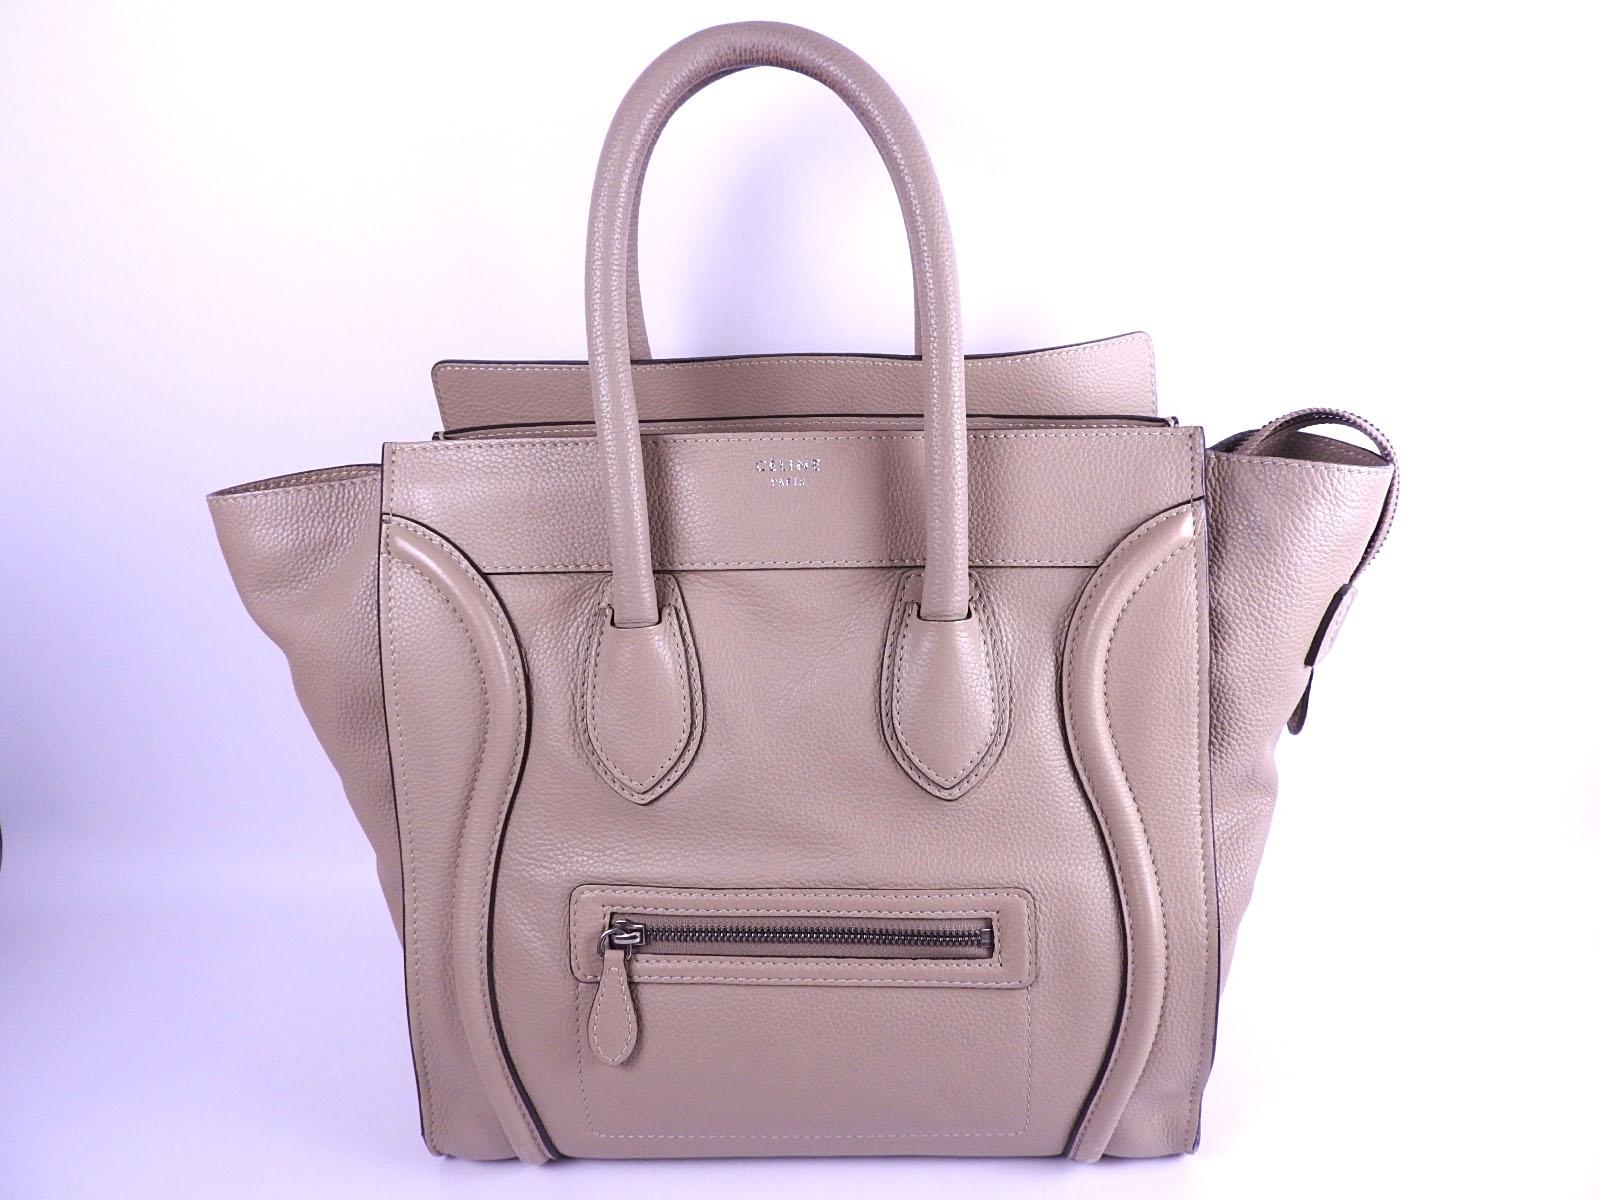 Details about CELINE Luggage Mini Shopper Tote Hand Bag Calf Leather Dune  Beige 165213 A-8858 052ab0517bdec